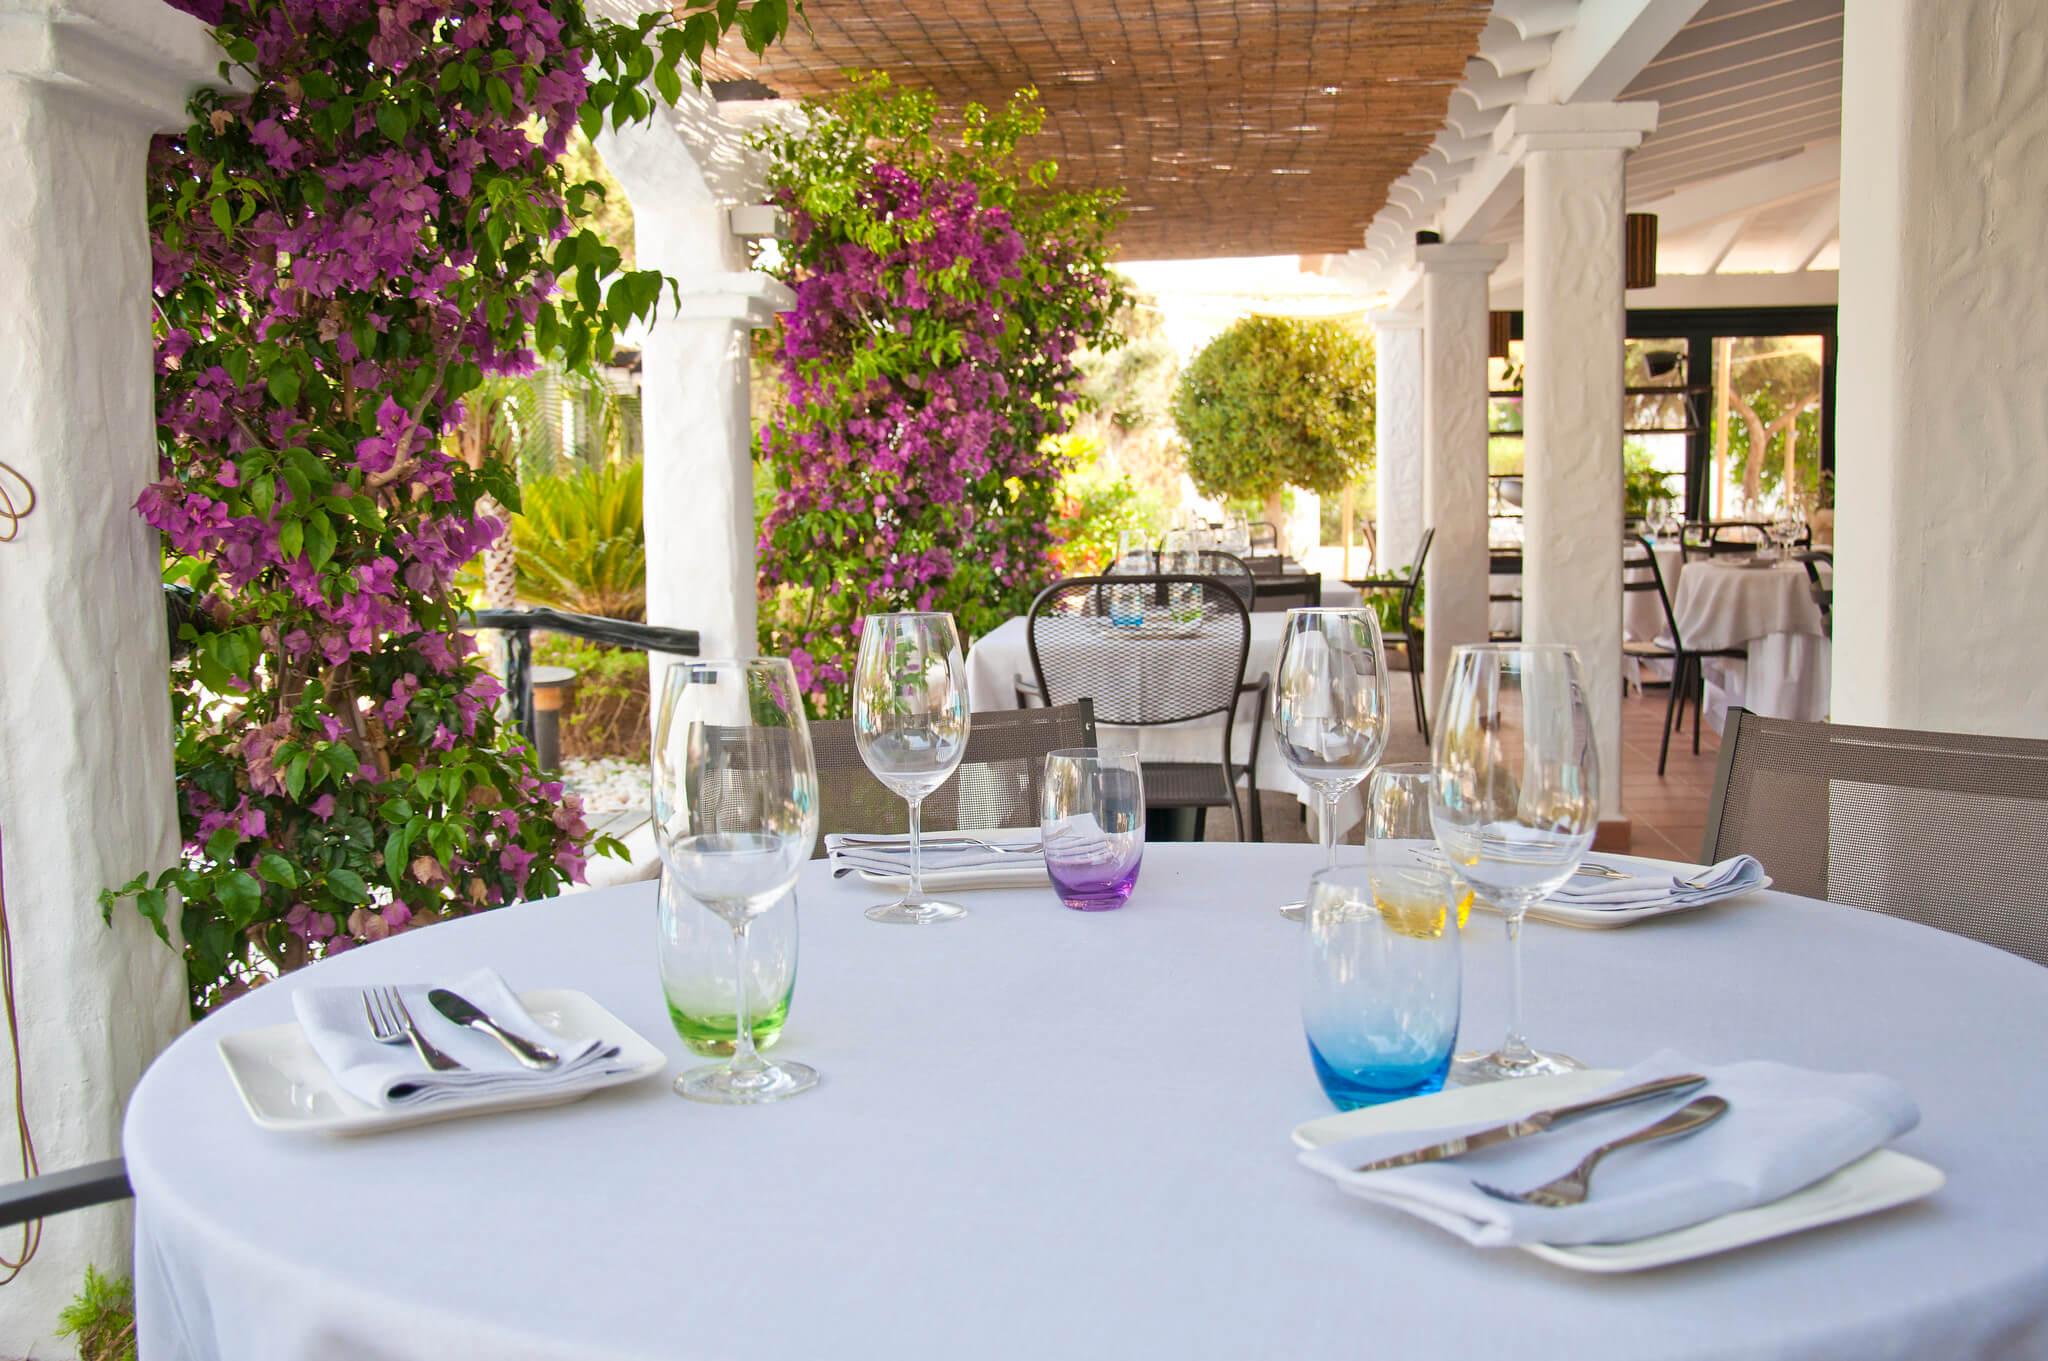 https://www.white-ibiza.com/wp-content/uploads/2020/03/formentera-restaurants-marlaca-2020-03.jpg